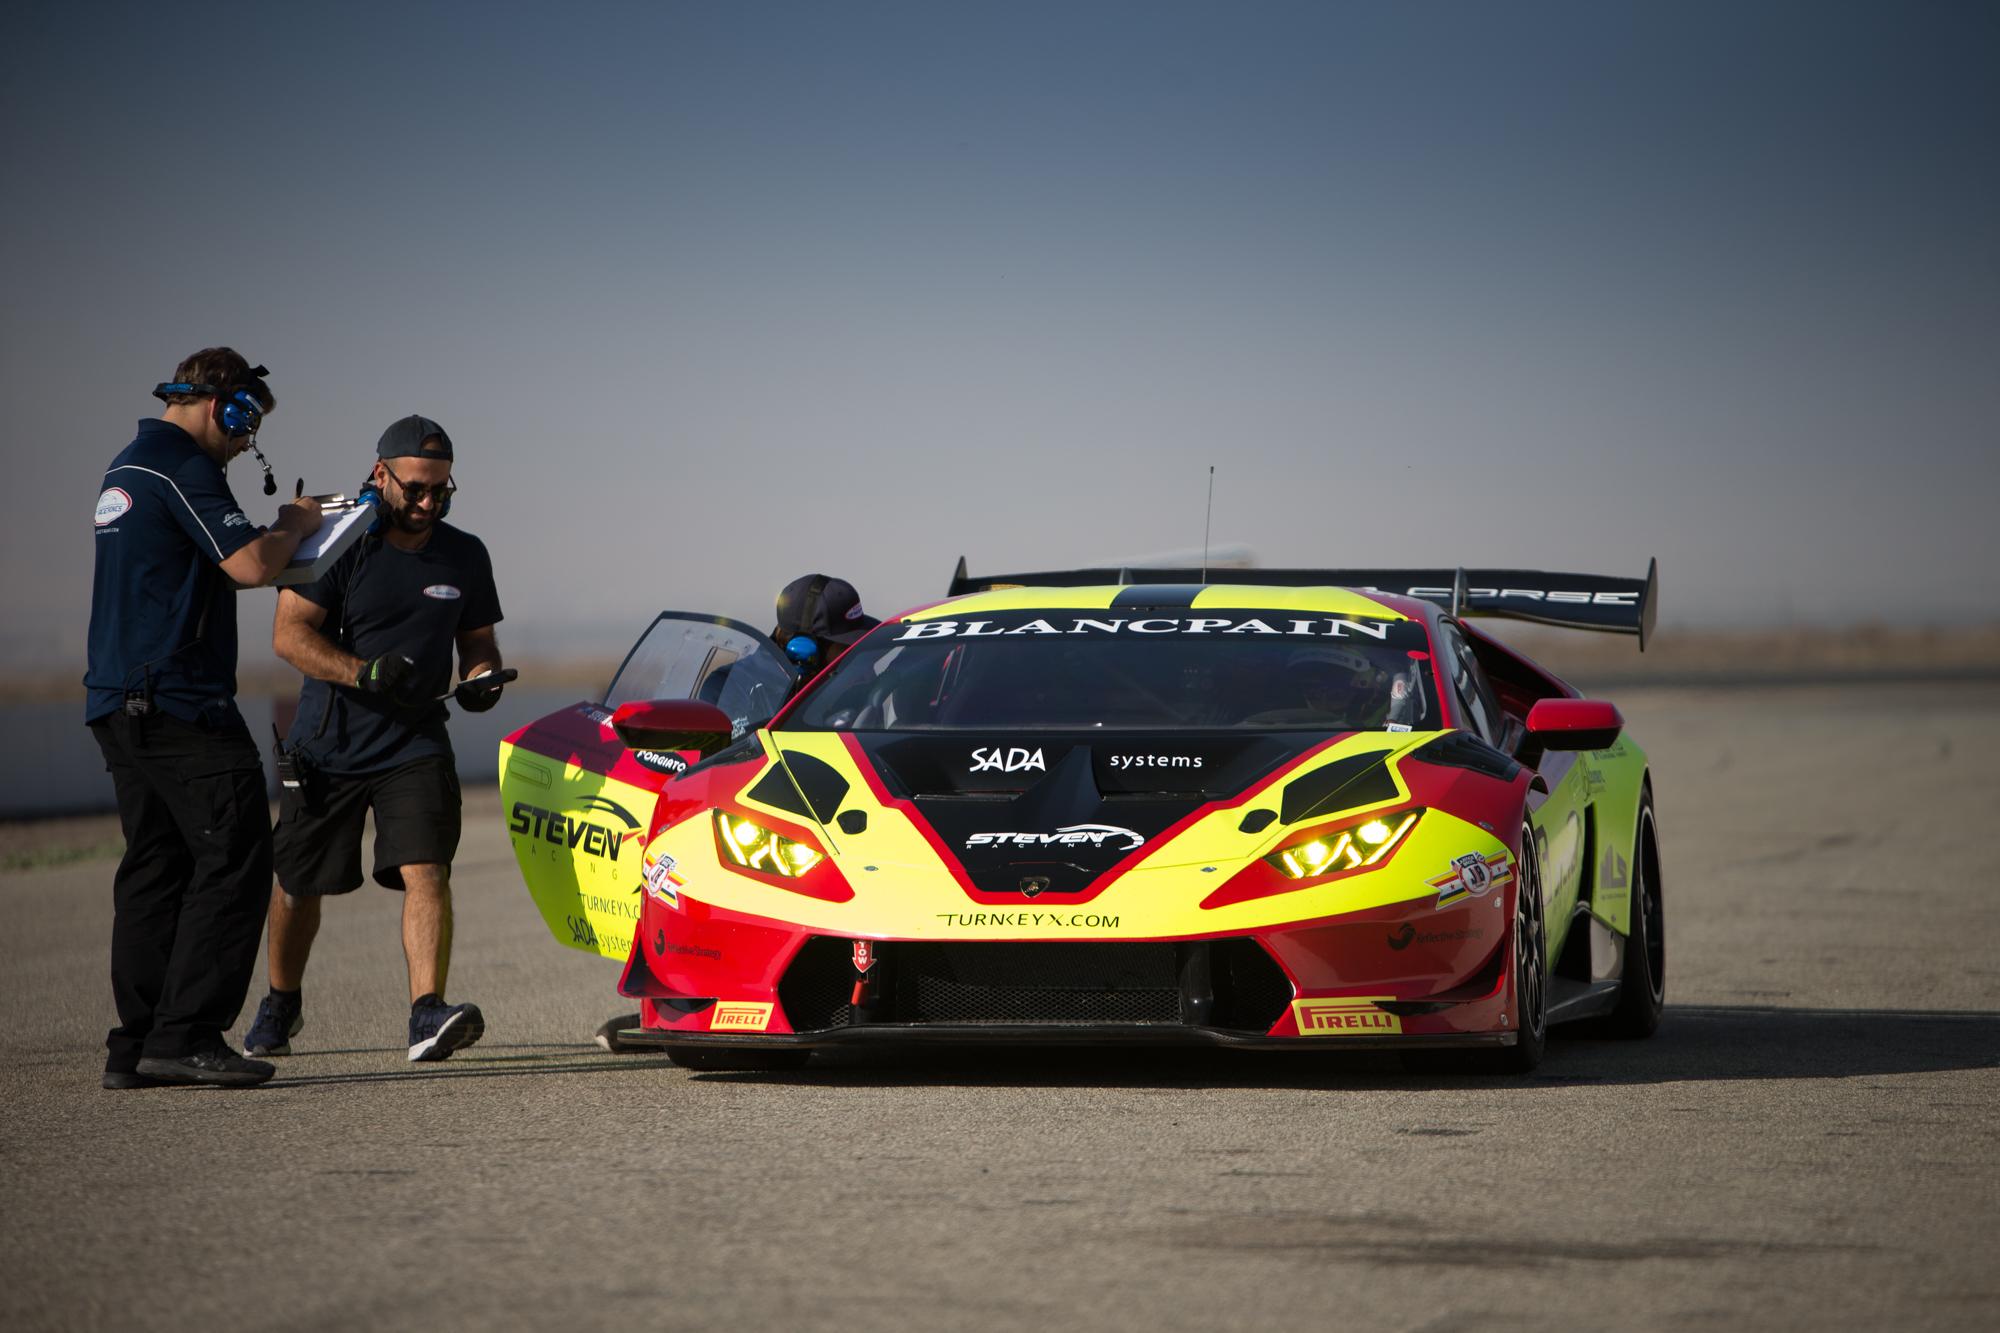 Steven-Racing-20171027-53613.jpg